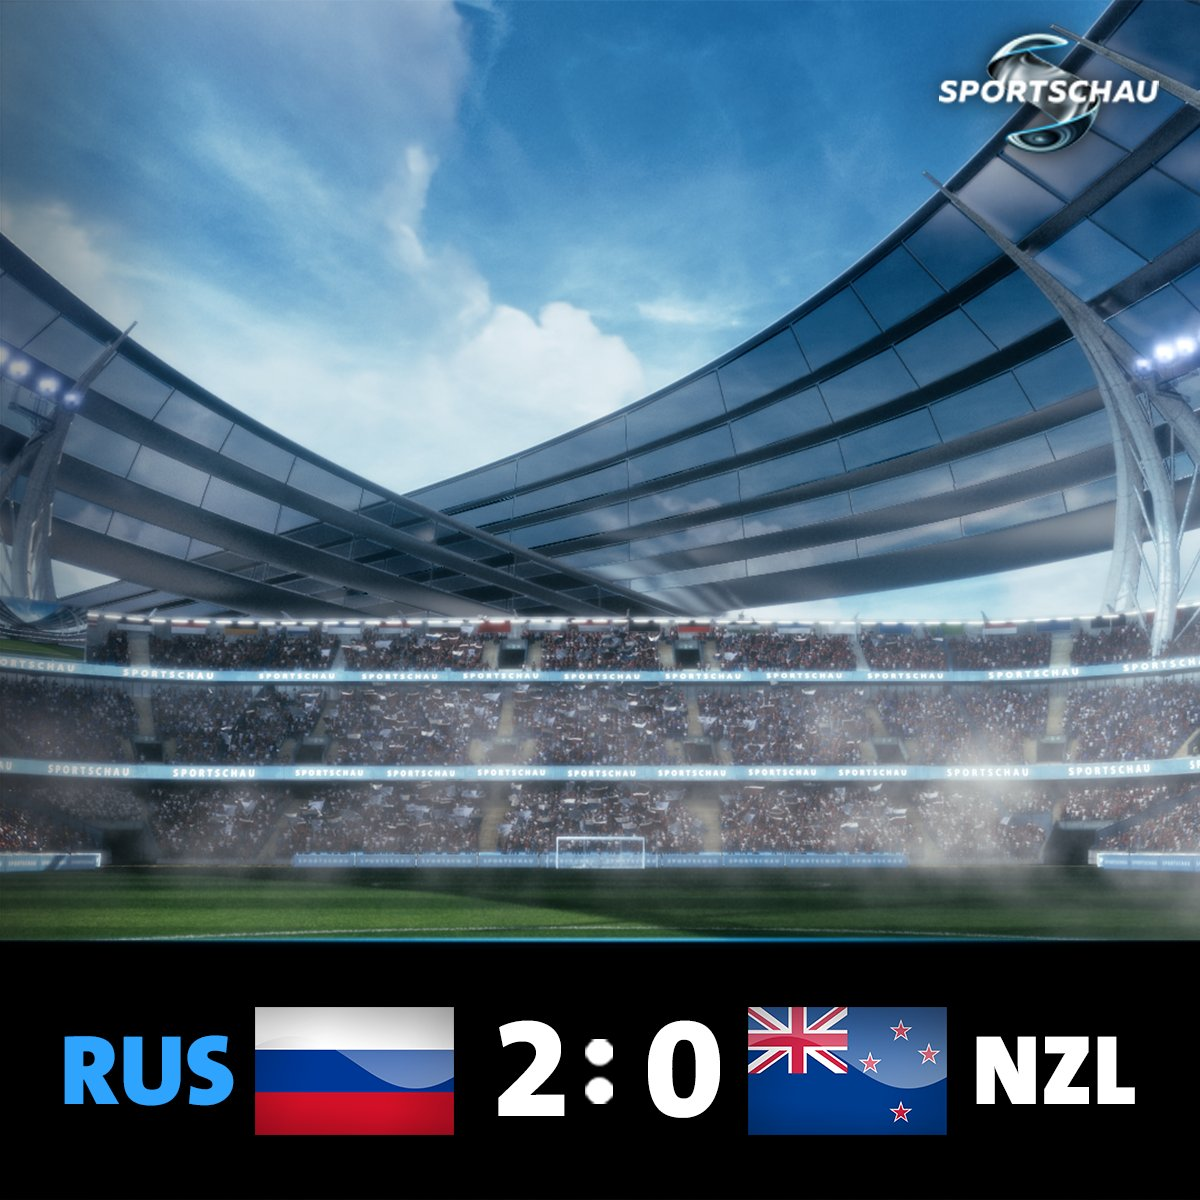 #RUSNZL